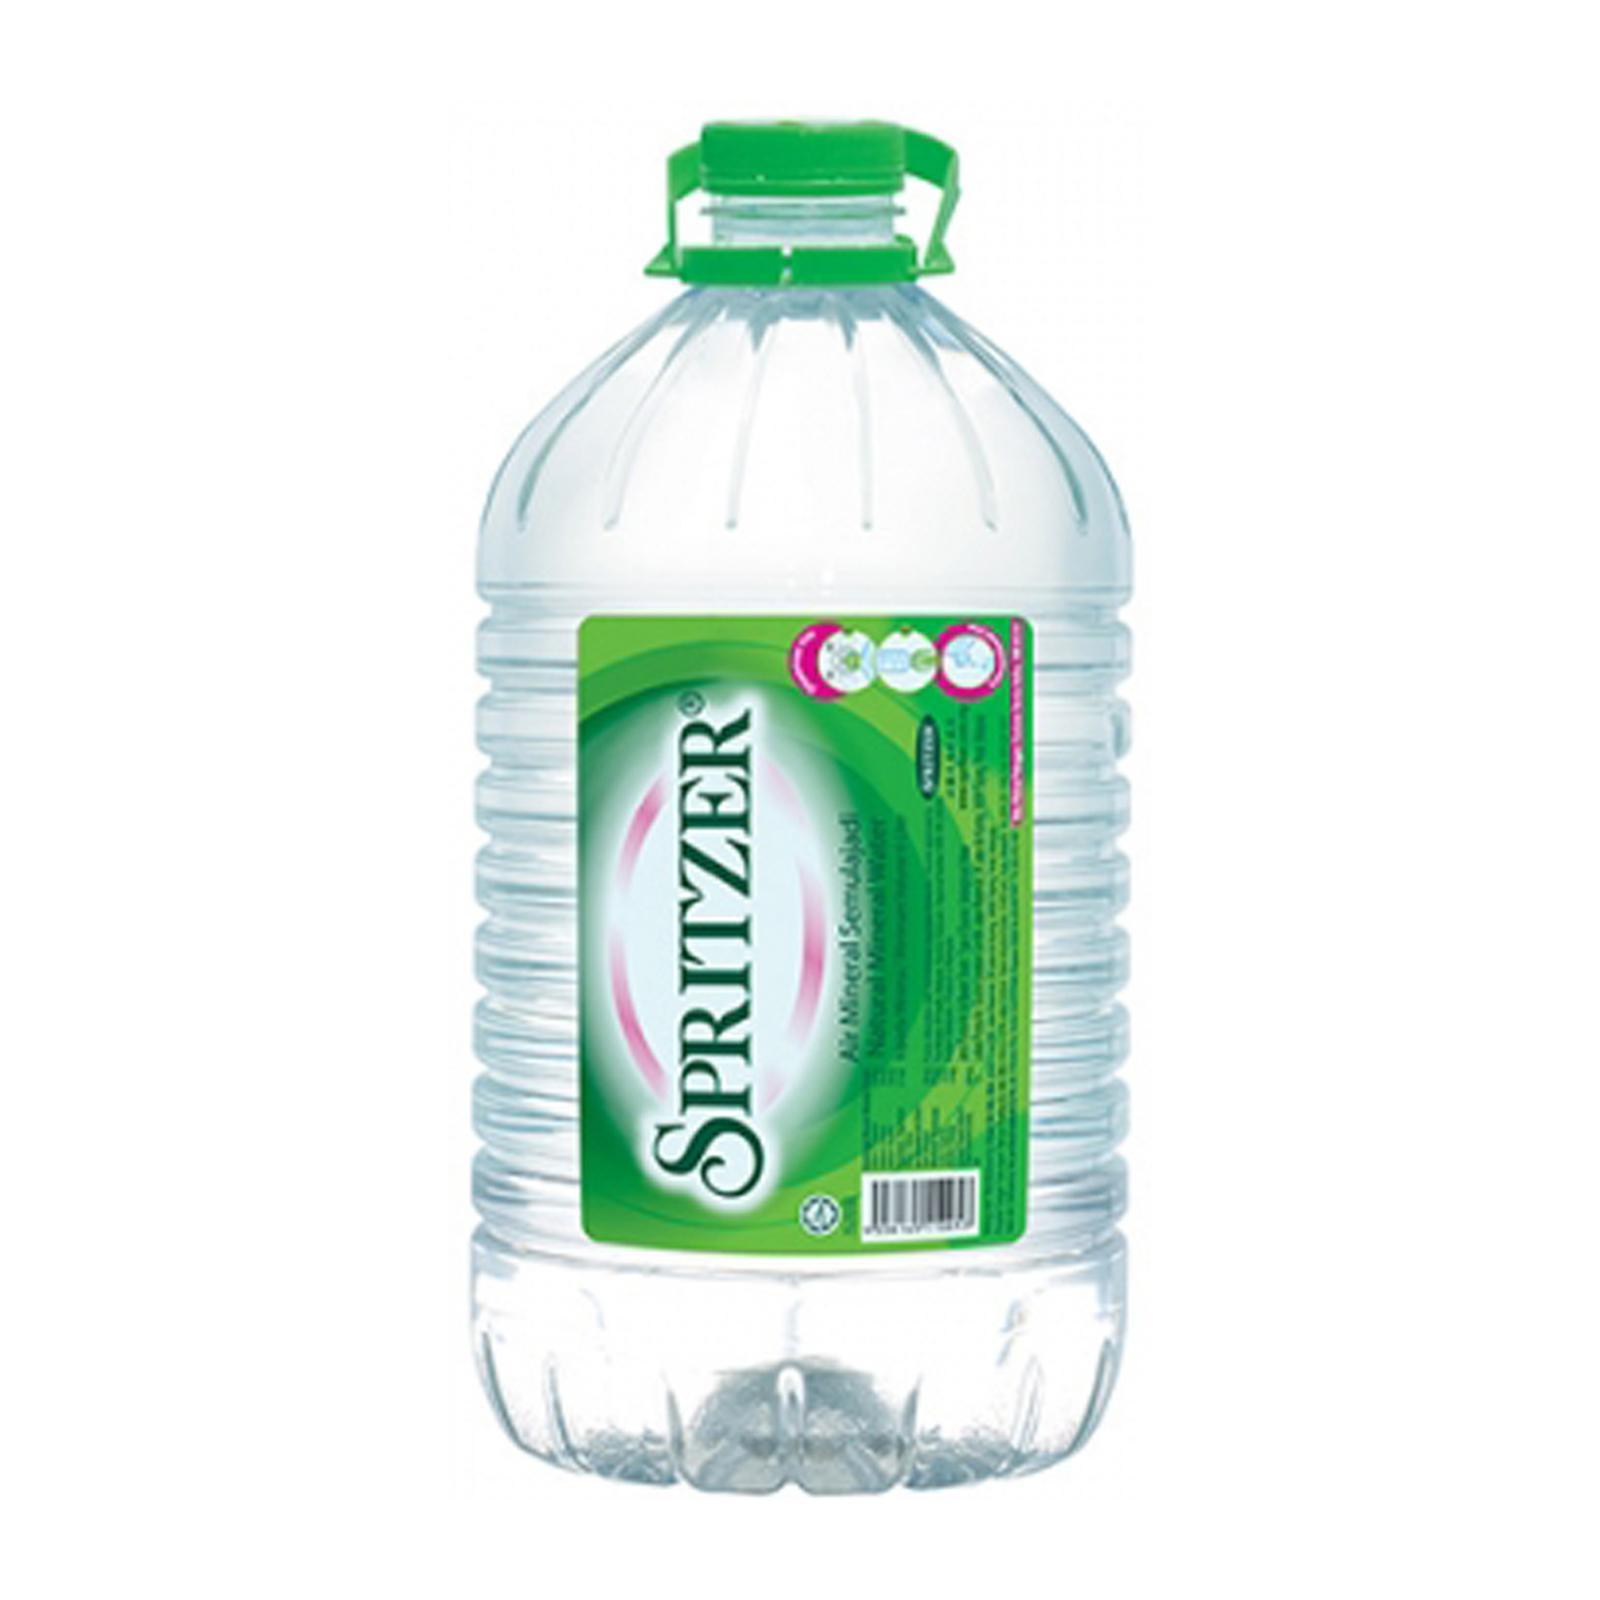 Spritzer Natural Mineral Water- Case